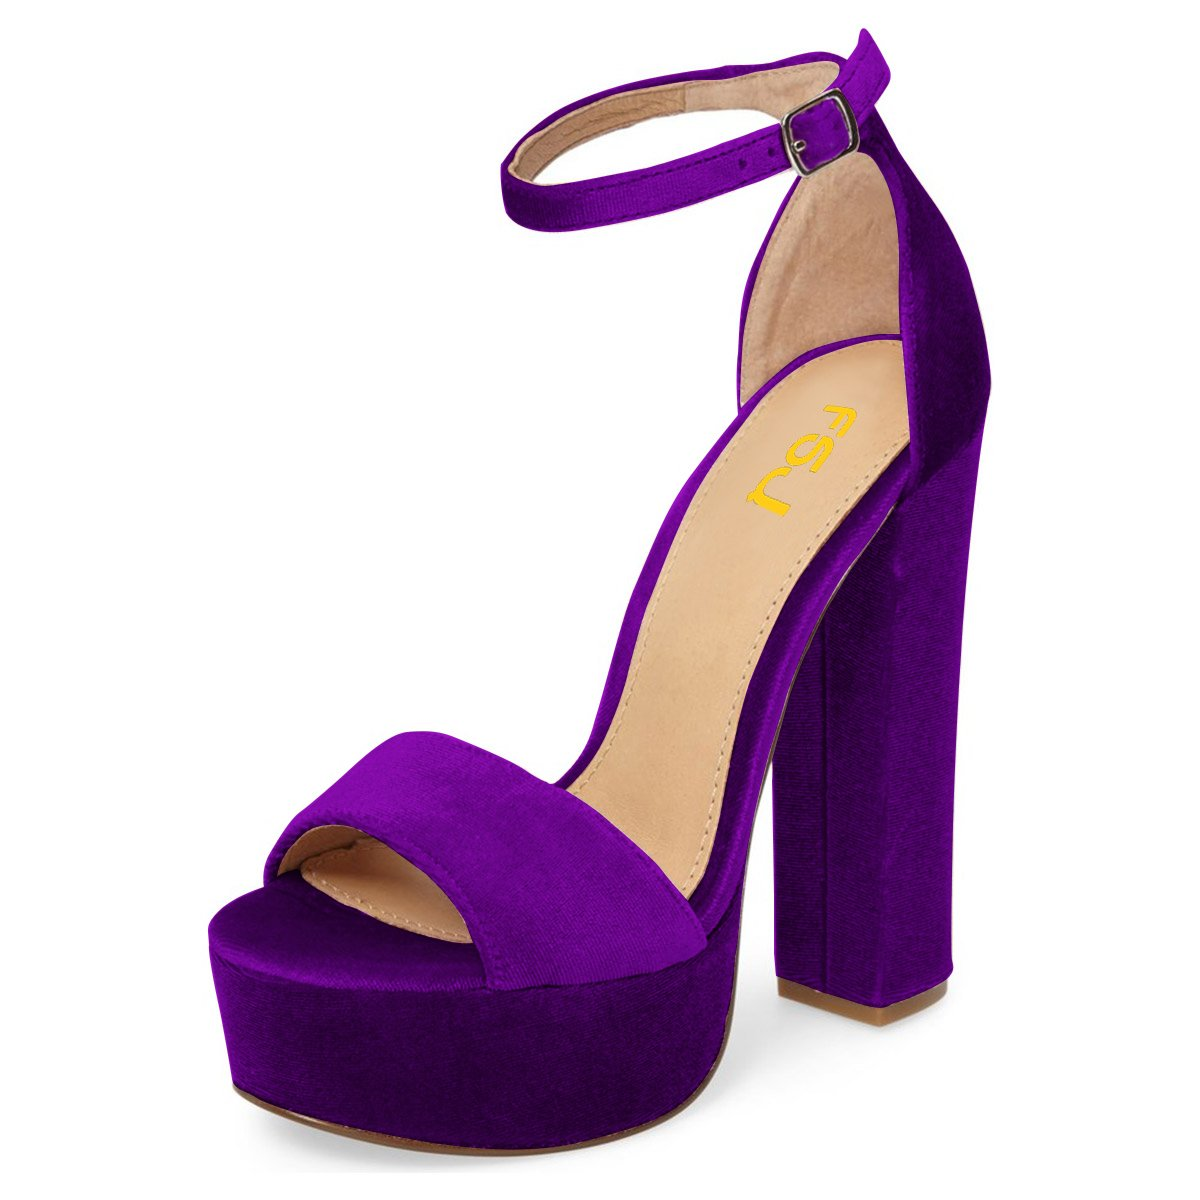 FSJ Women Sexy Ankle Strap Platform Sandals Chunky High Heel Open Toe Velvet Shoes Size 4-15 US B0796Q8K4L 14 B(M) US|Purple